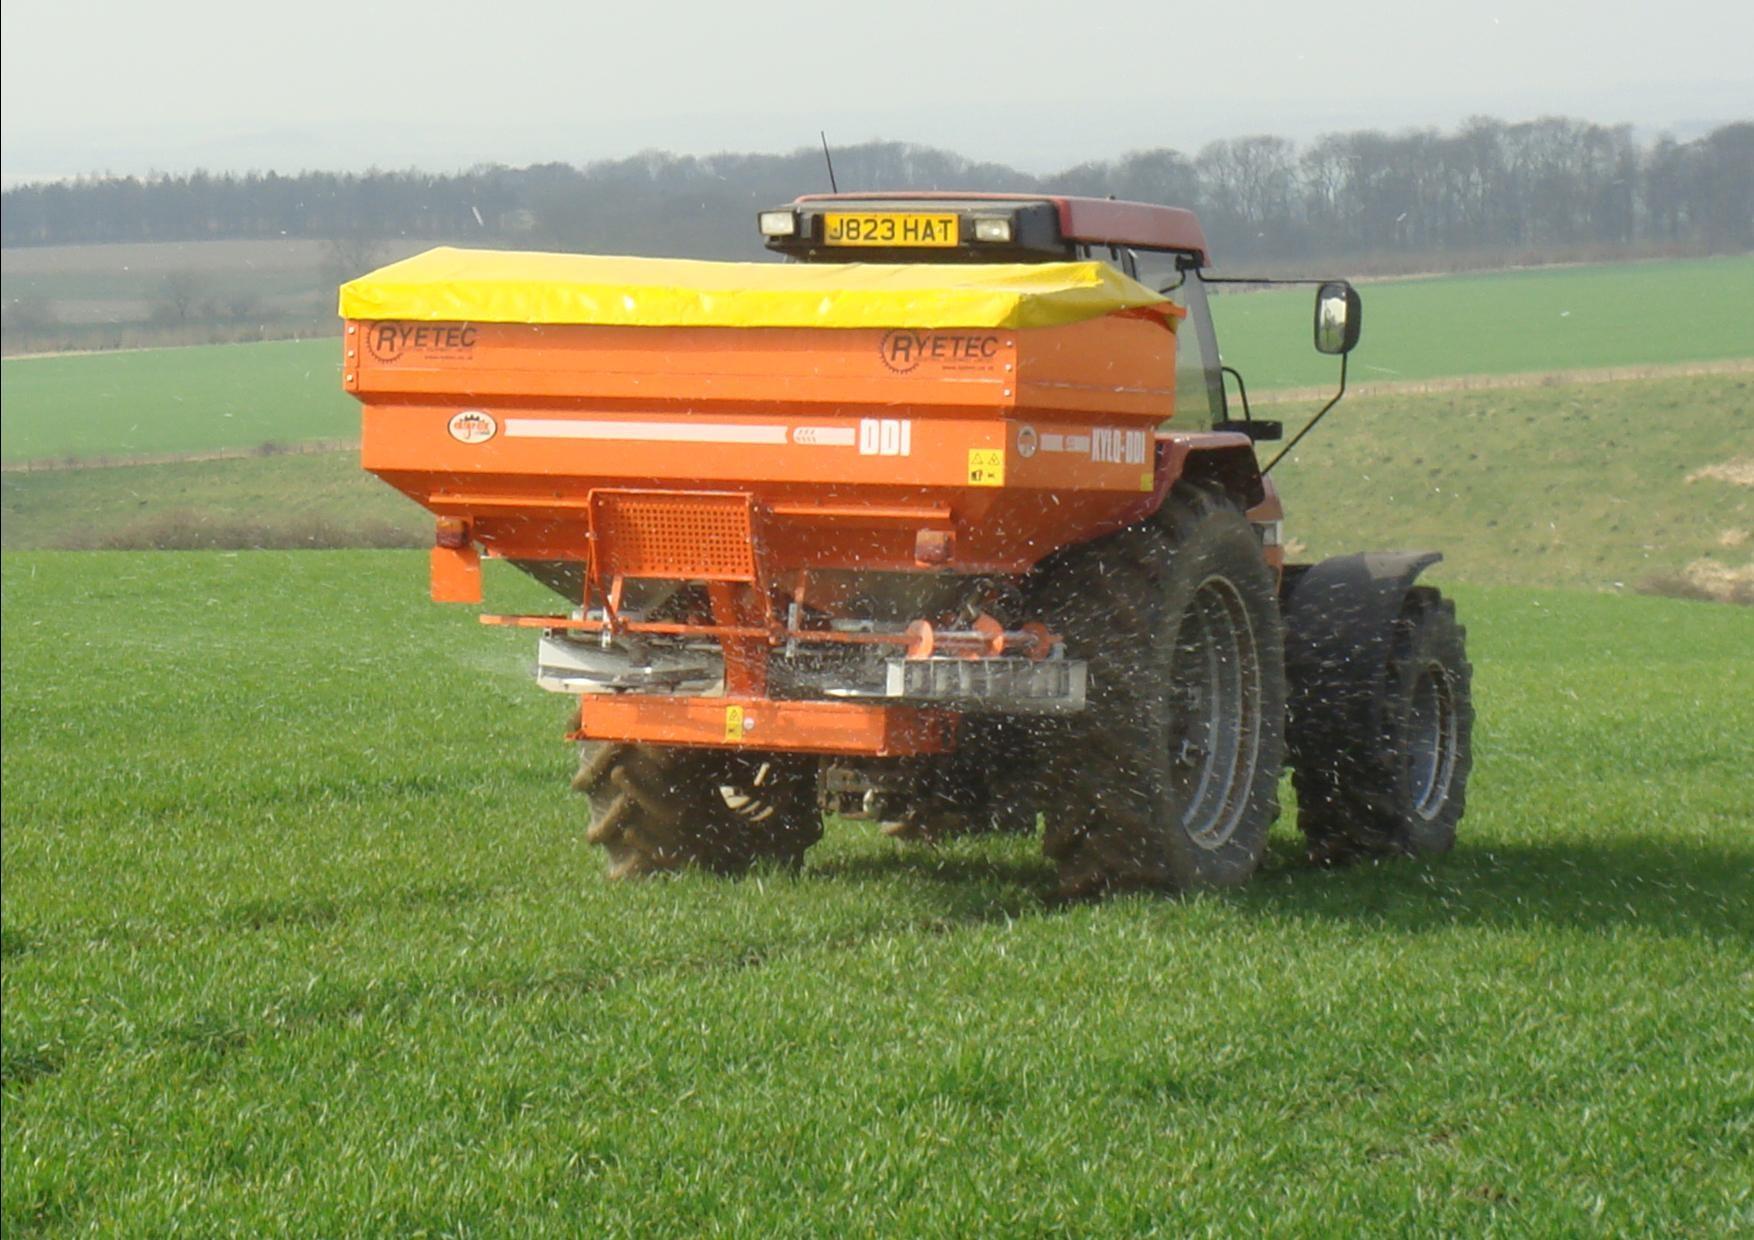 Ryetec Agrex DDI 3 ton weigh cell fertiliser spreader